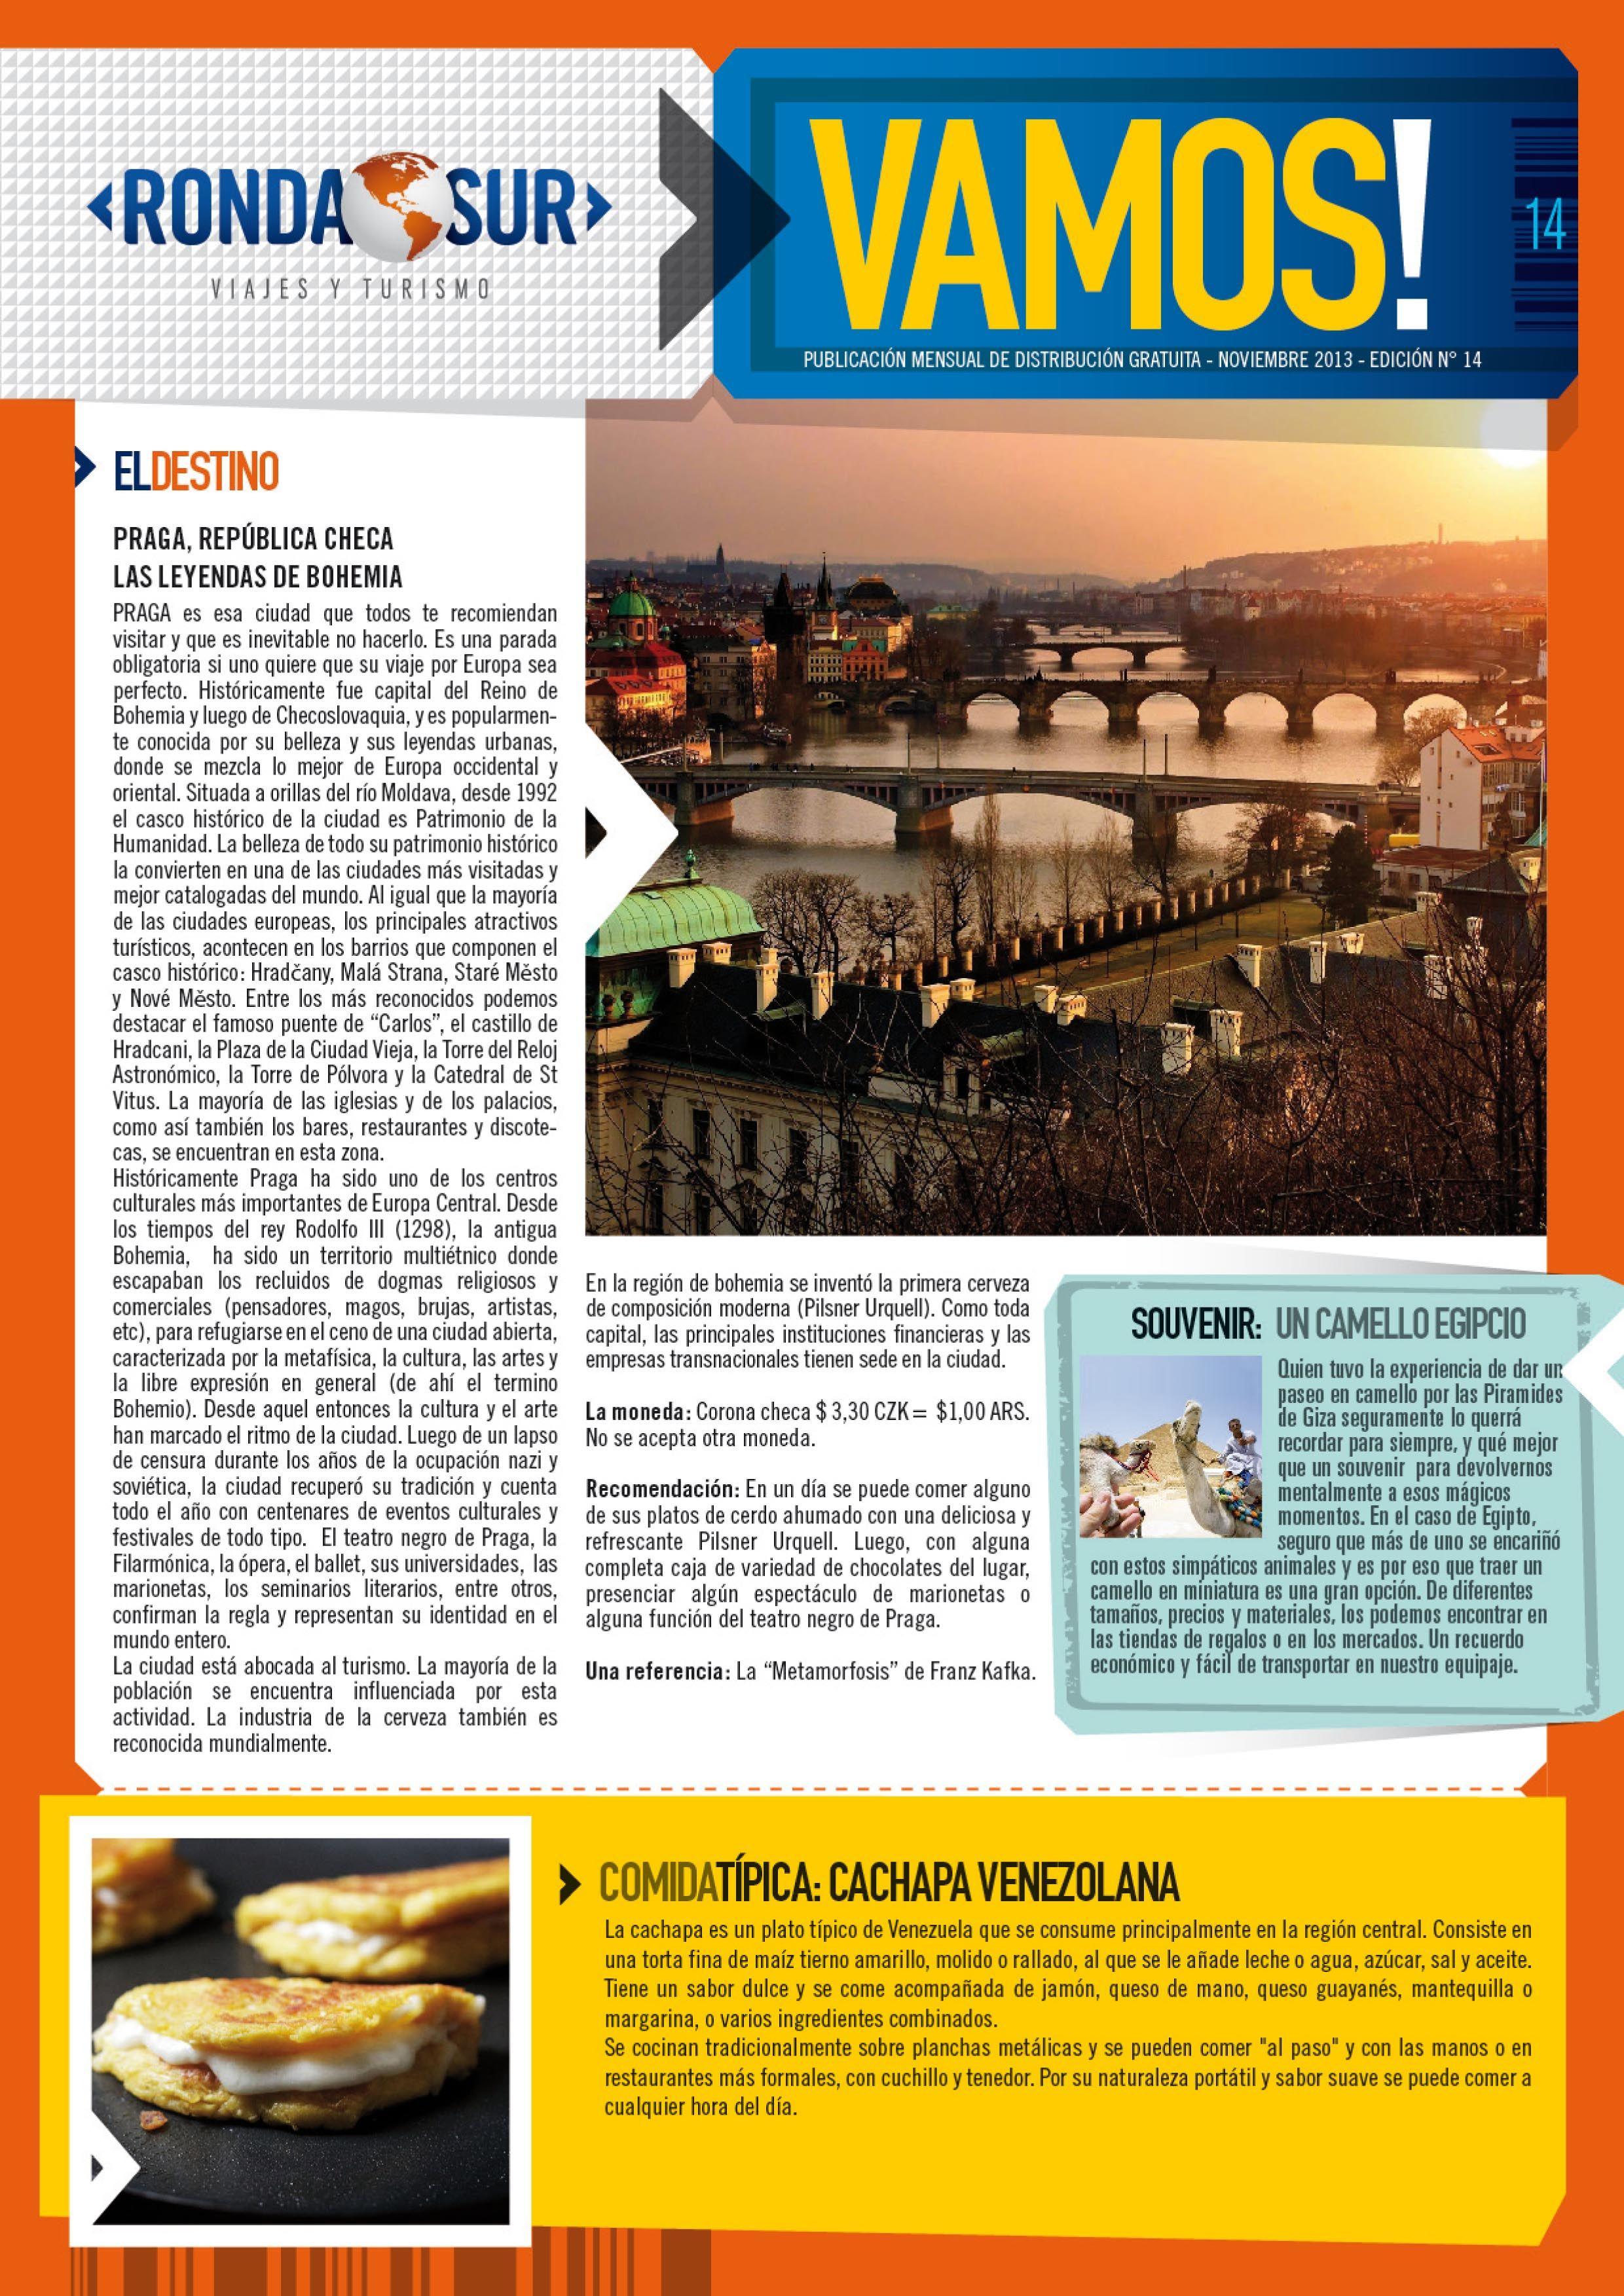 Revista Vamos Nº 14! Podés leerla haciendo Clik en este link: http://issuu.com/vamos_rondasur/docs/vamos_n14 #Turismo #Viajes #Destinos